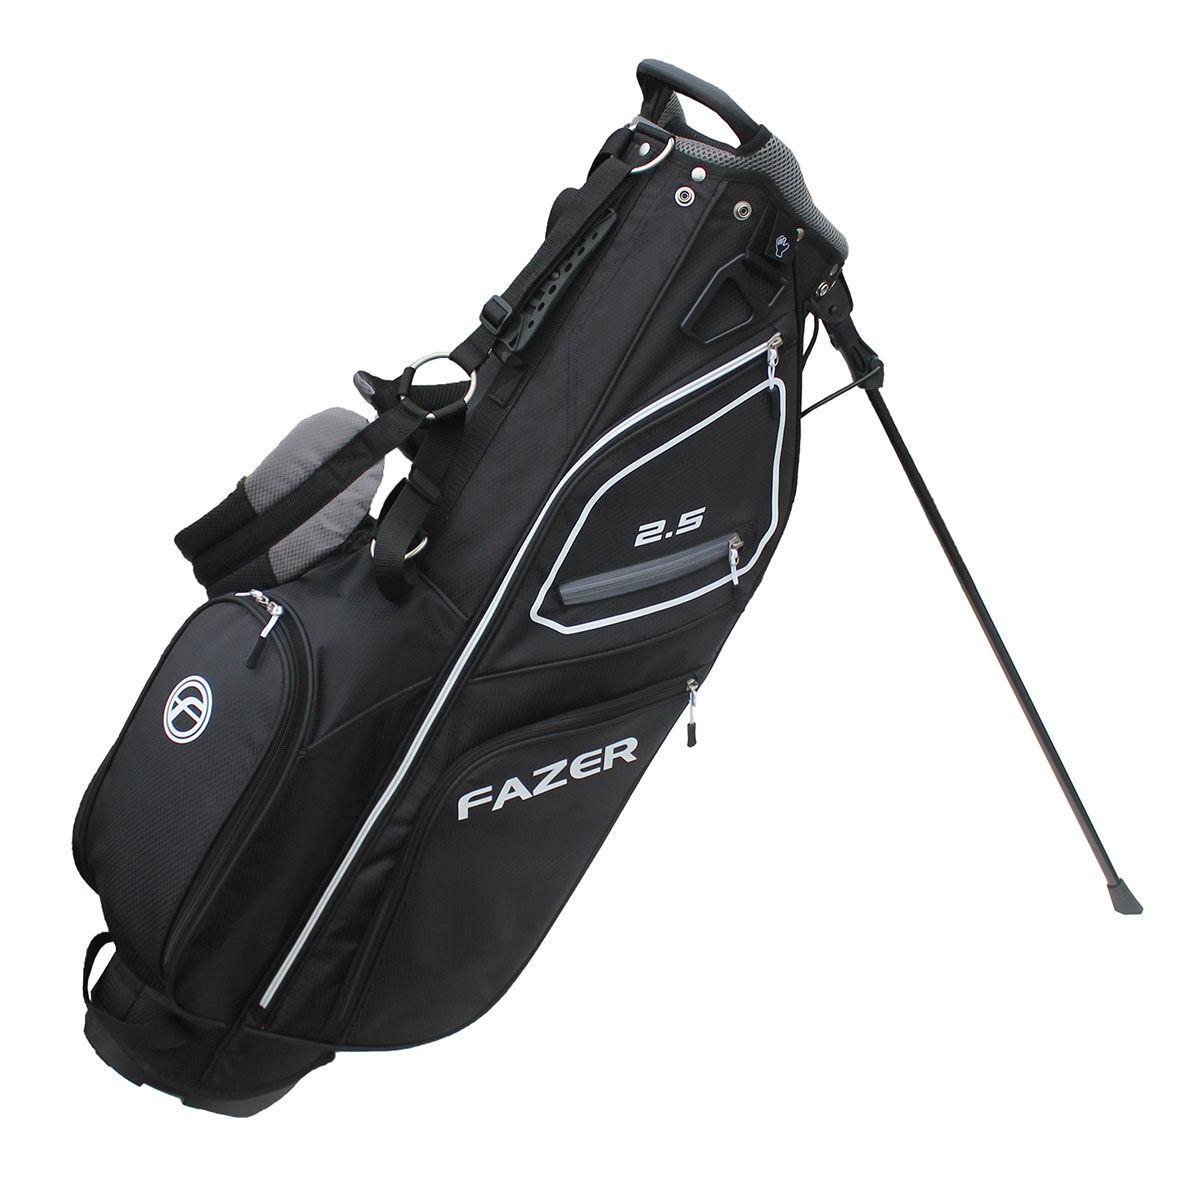 Fazer 2.5 Golf Stand Bag, Black/silver, One Size | American Golf